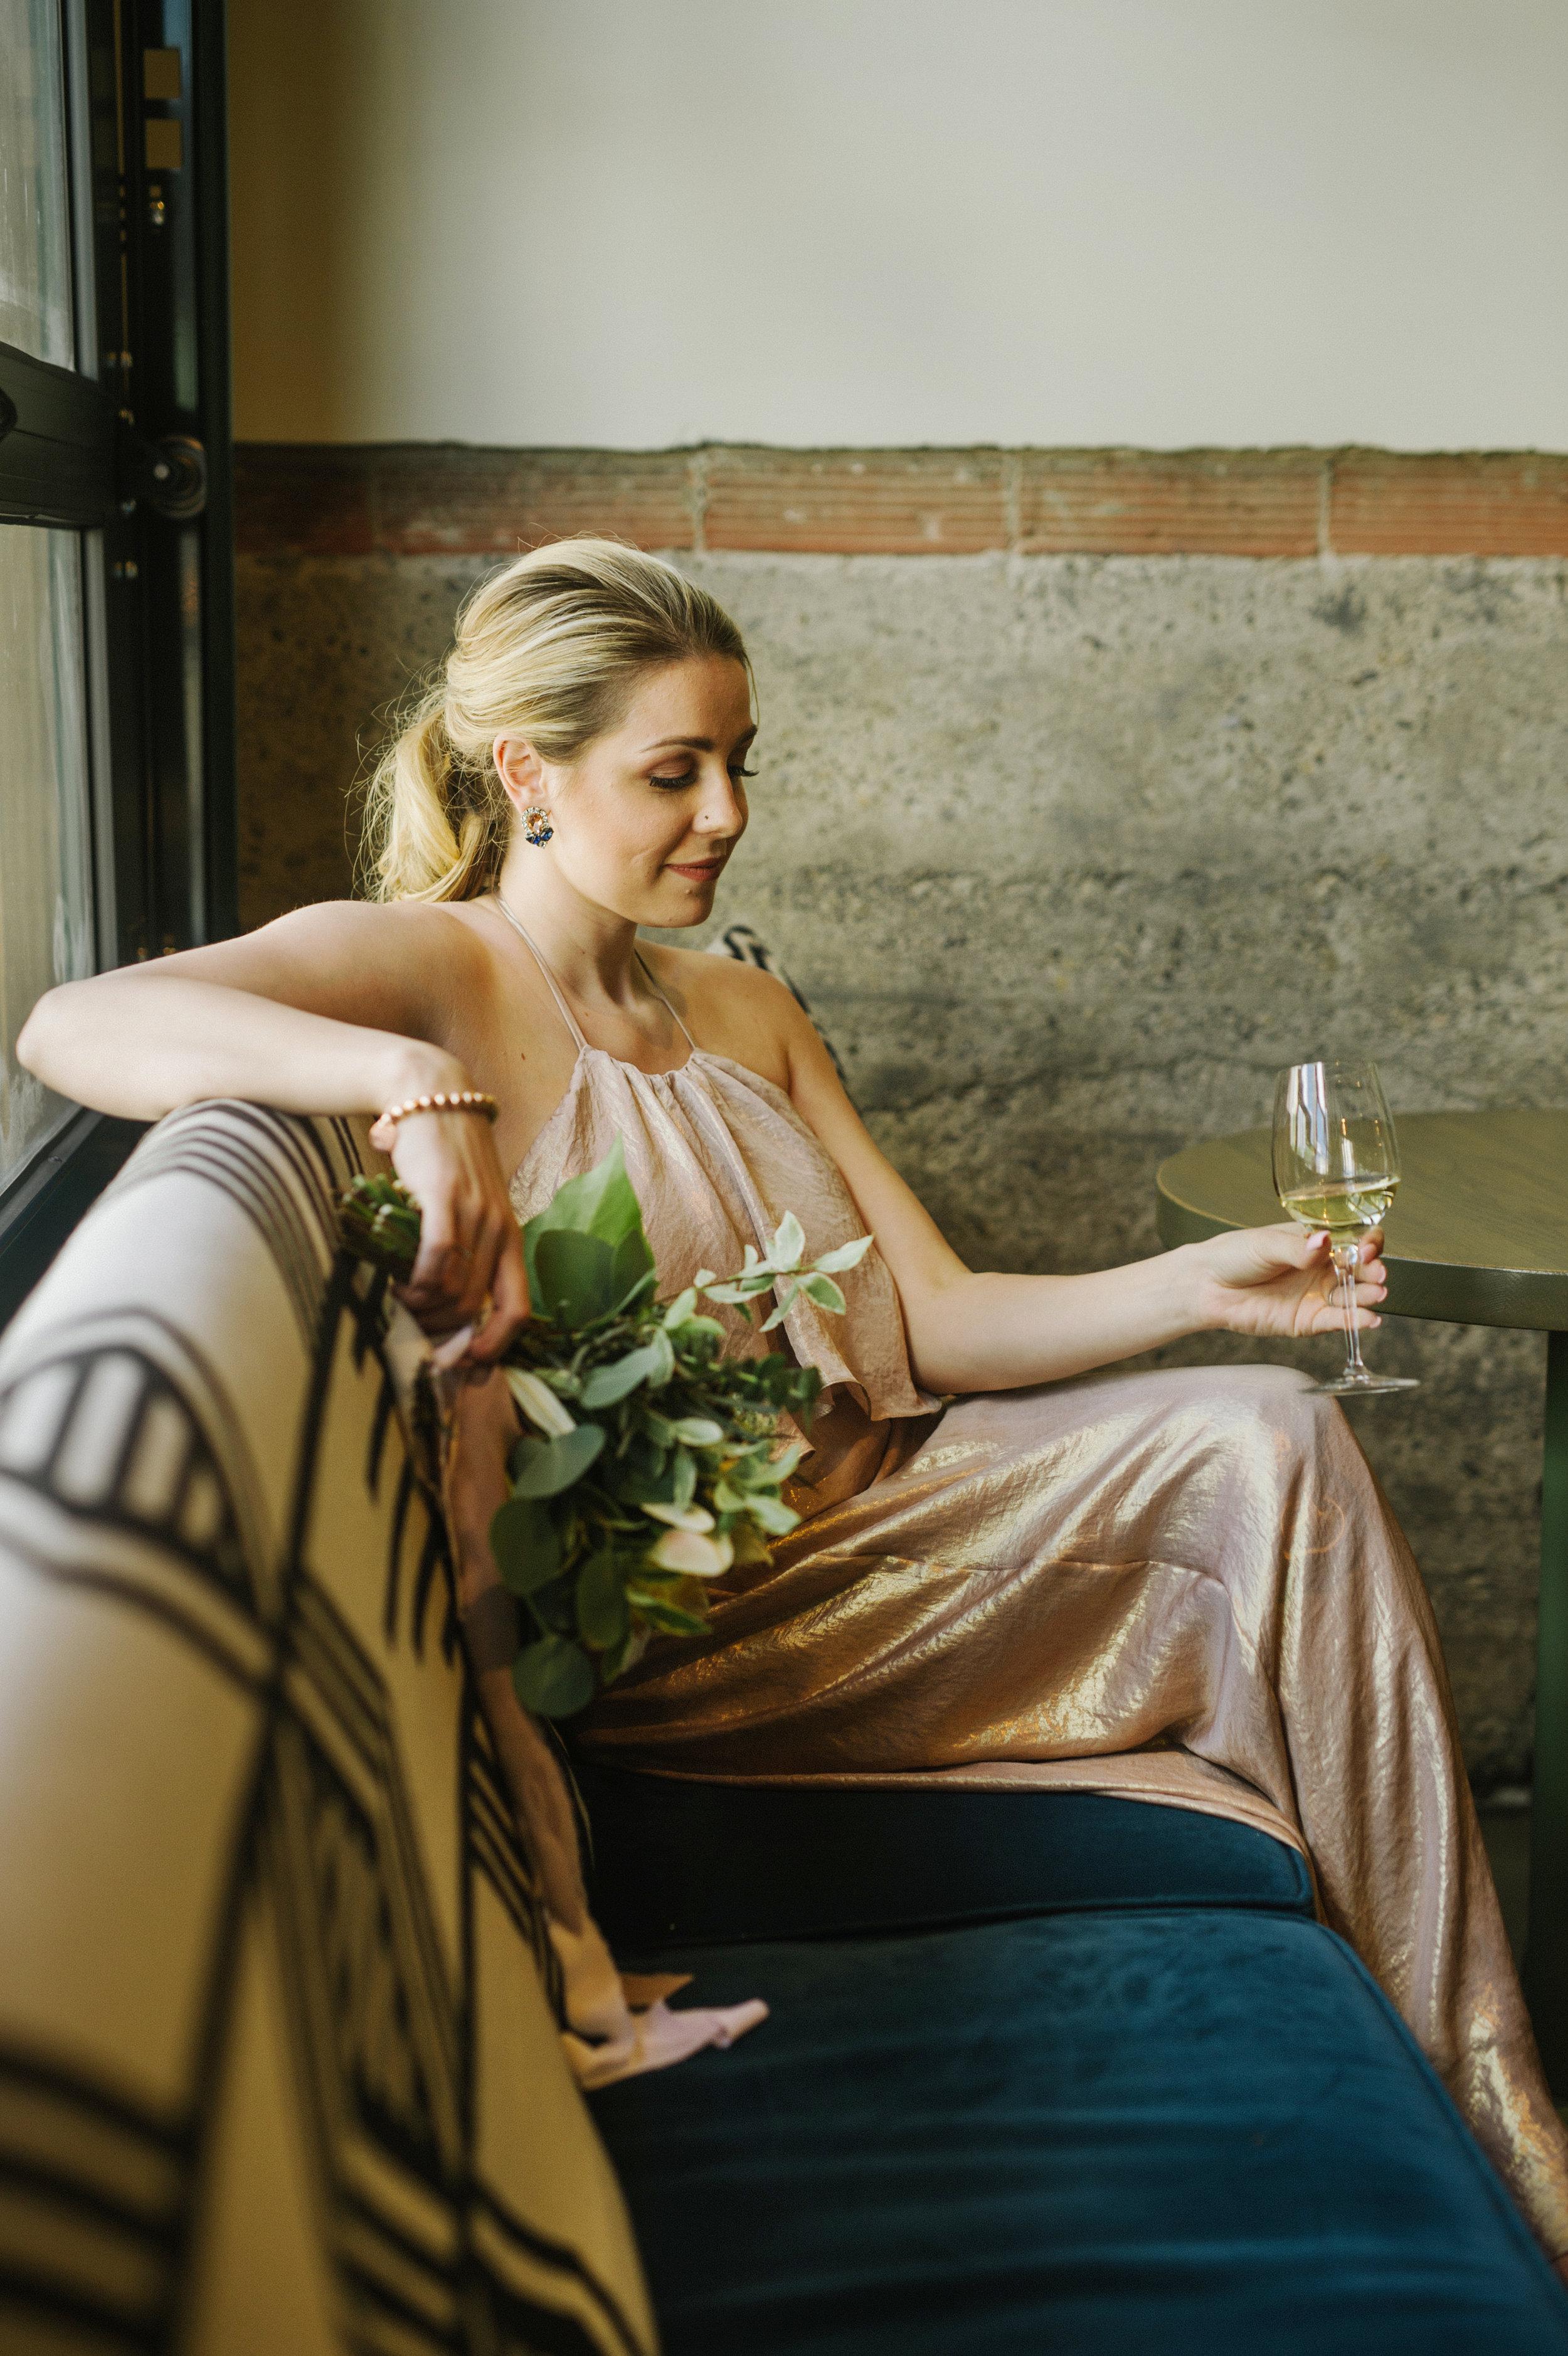 Calgary_Wedding_Photography_Bridgette_Bar_Bridesmaids_Shoot_2018_HR066.jpg